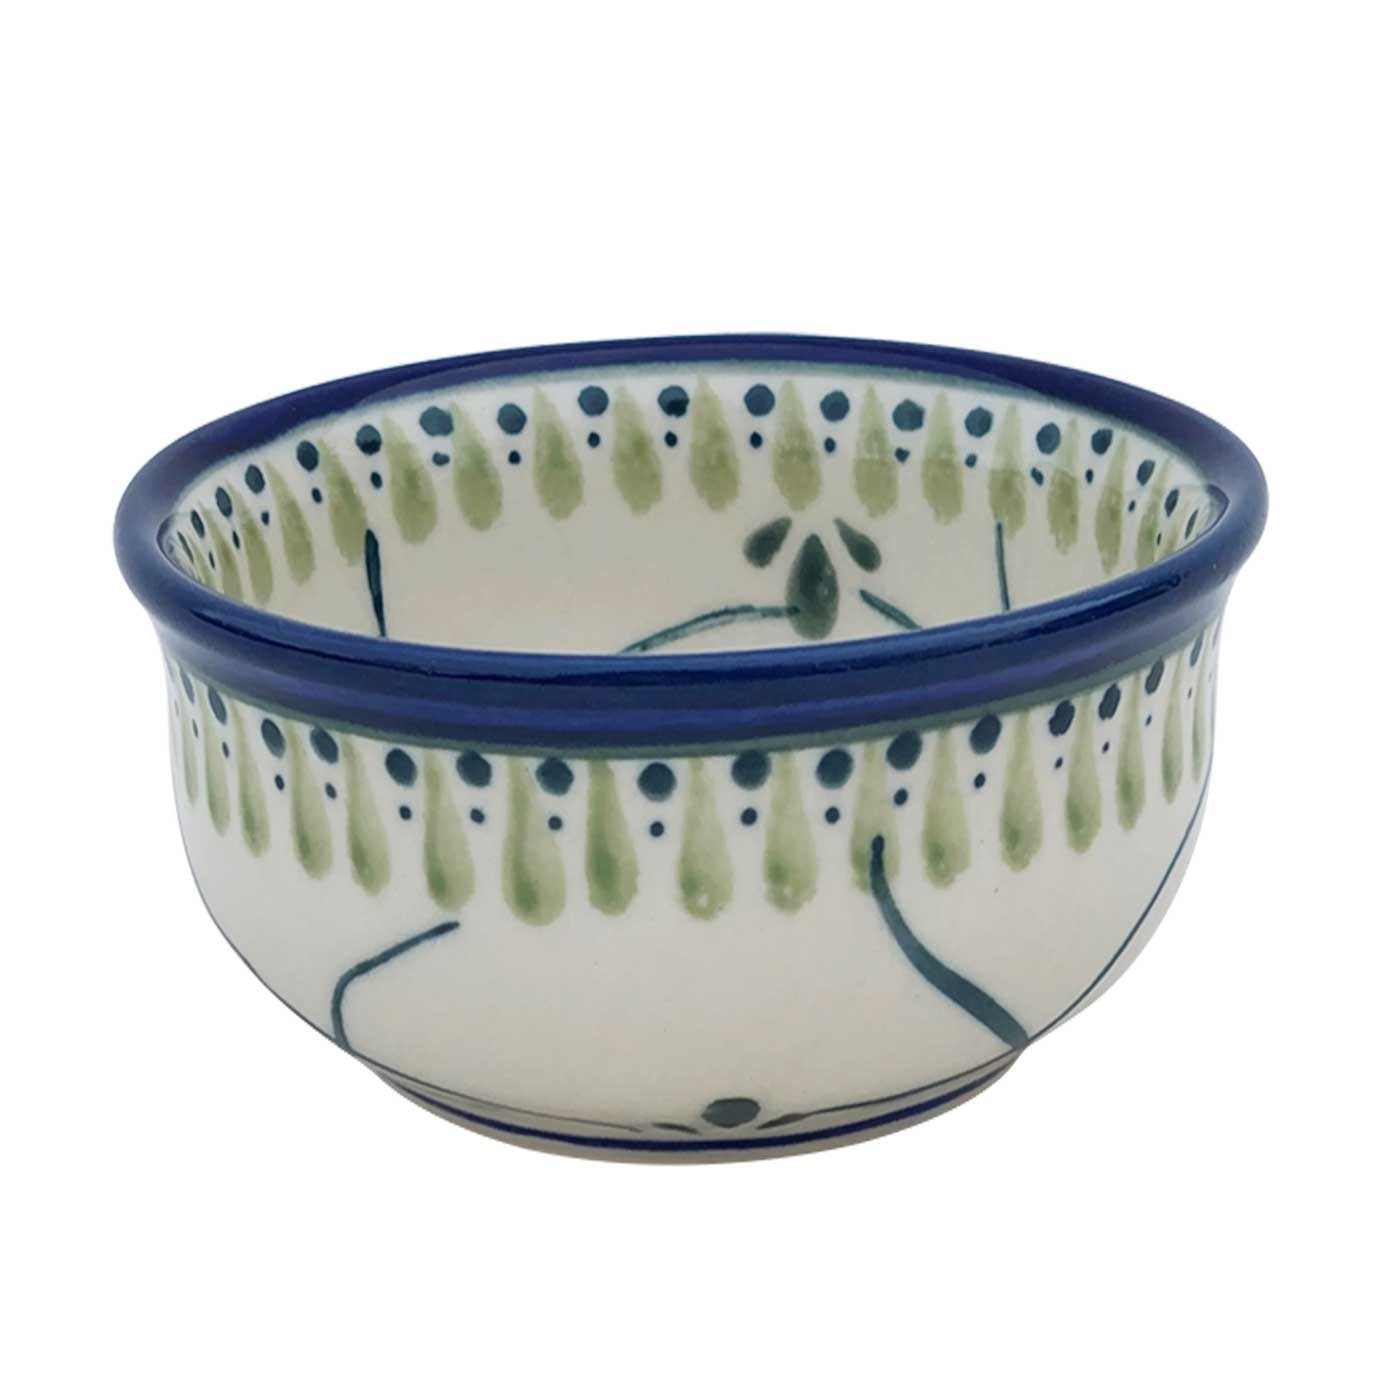 Pottery Avenue Sweetheart 4oz Small Stoneware Bowl